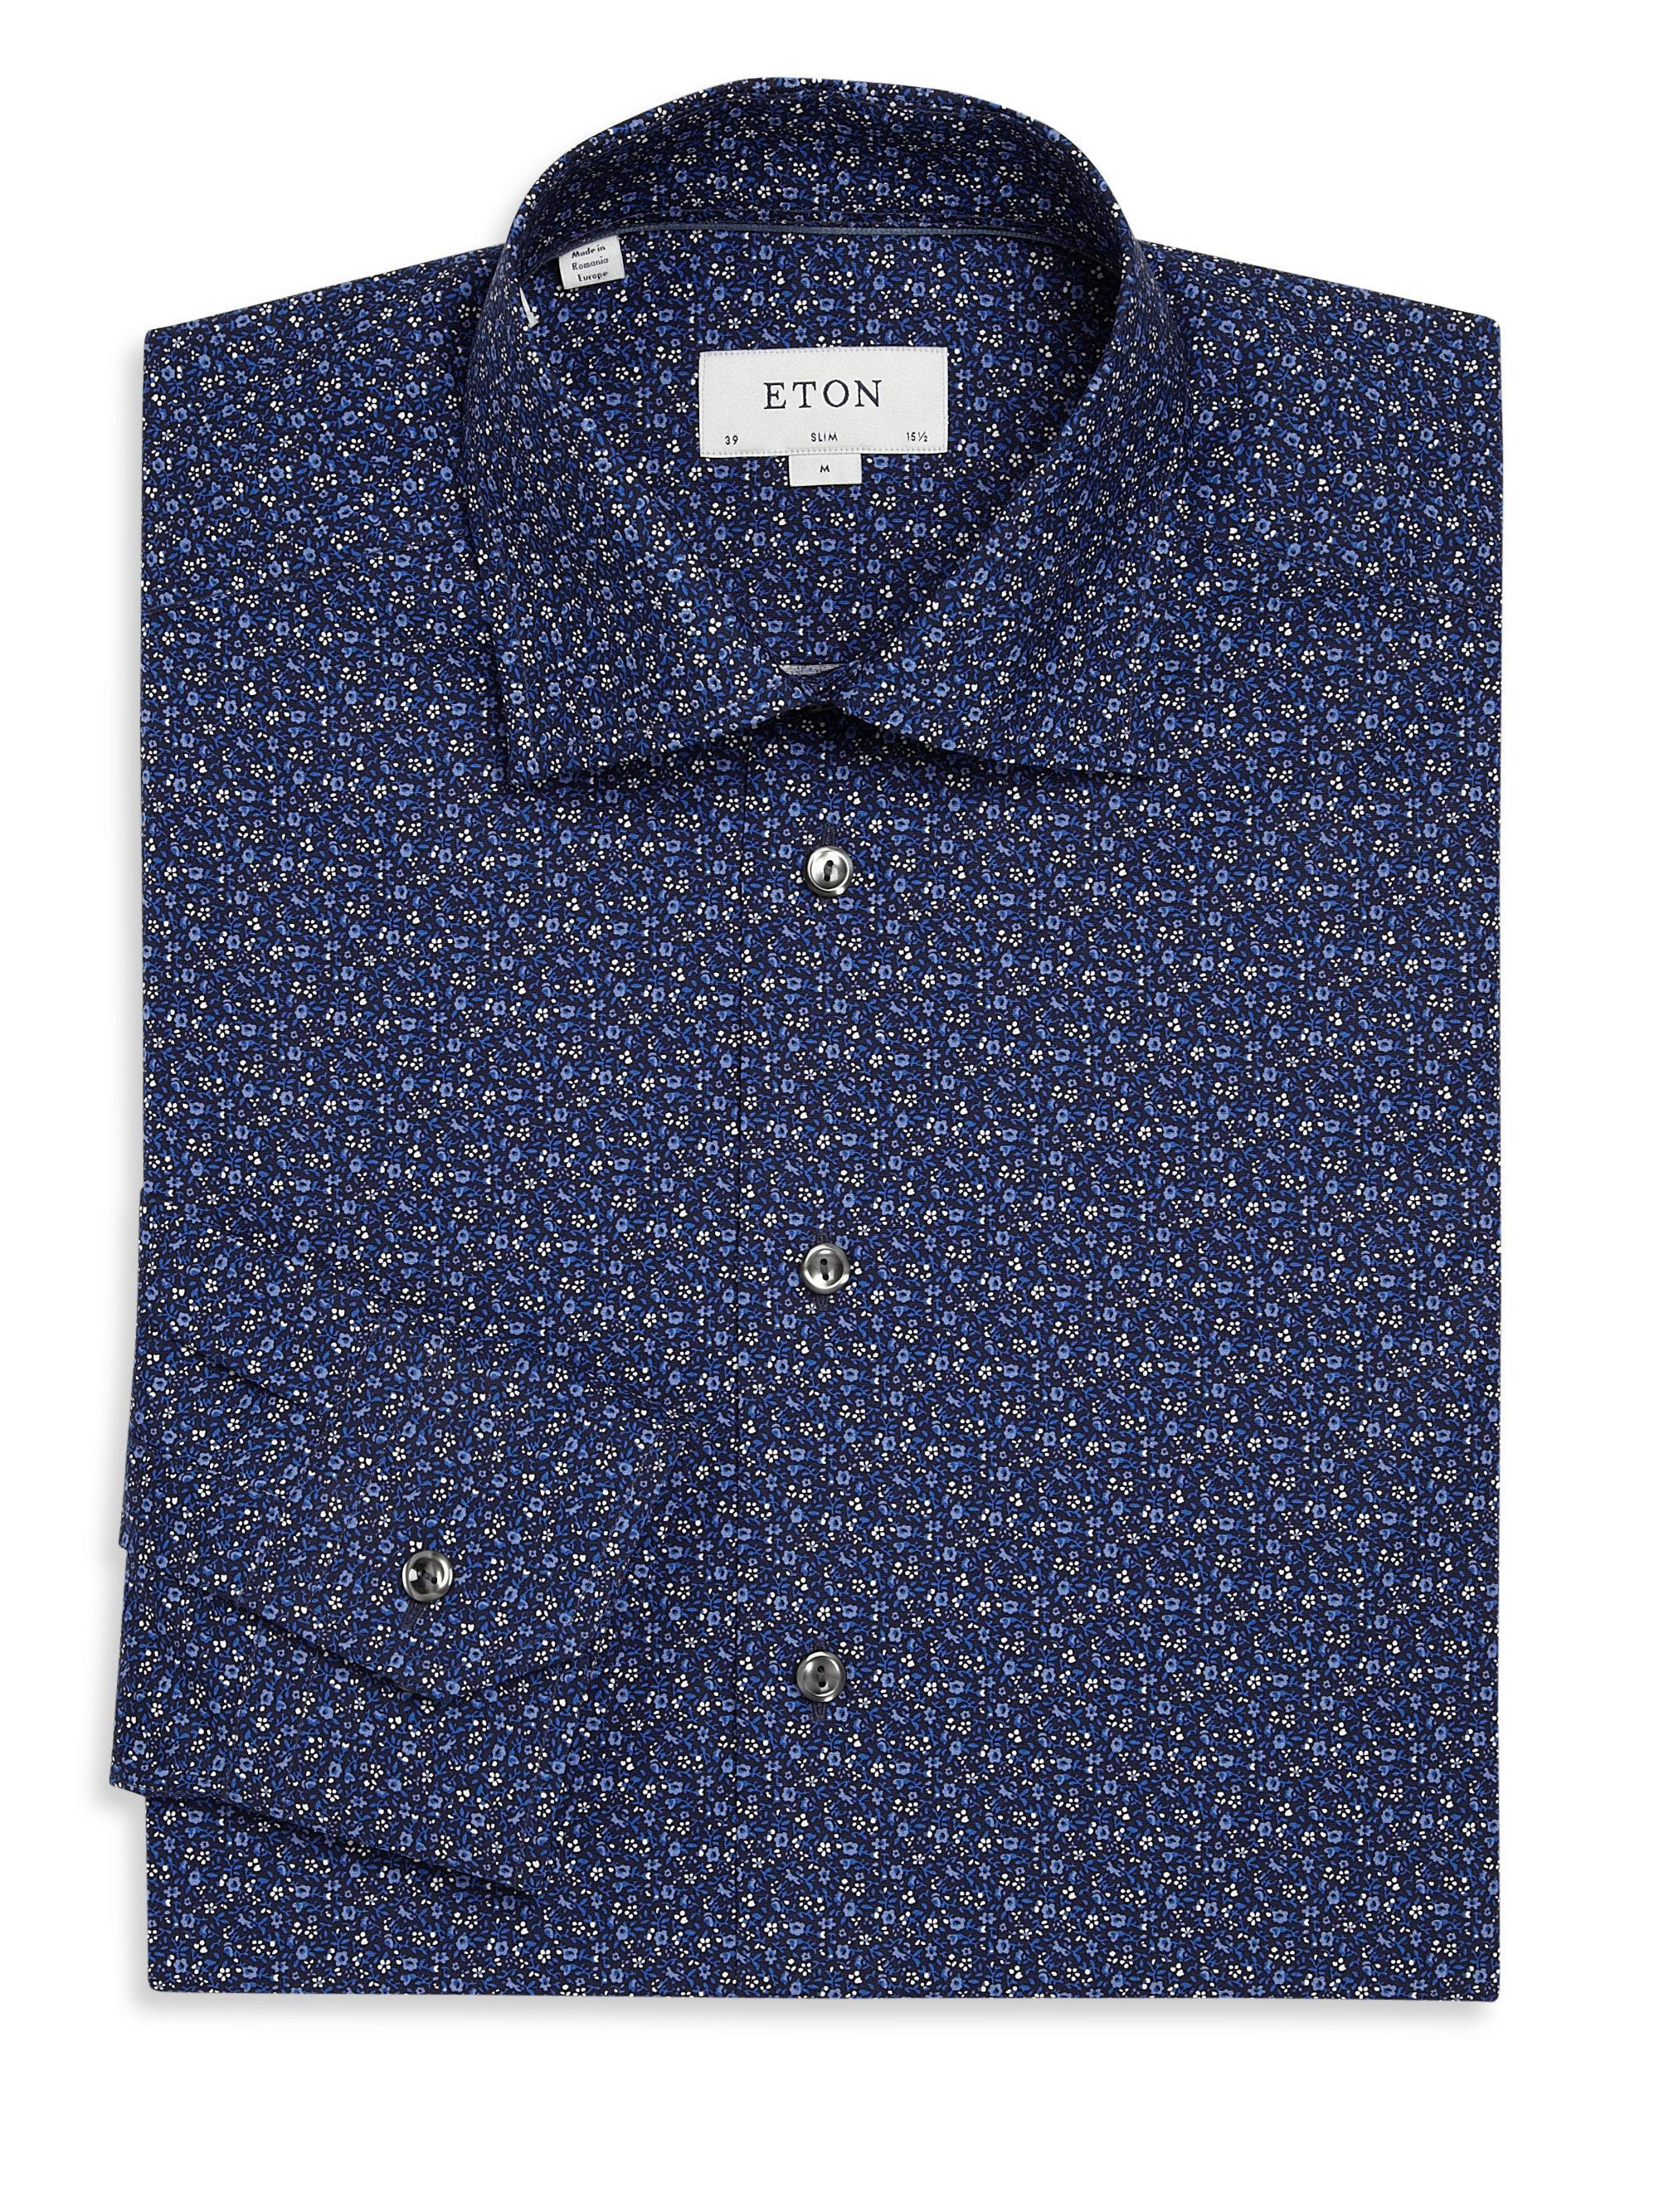 Eton of sweden Slim-fit Flower Print Dress Shirt in Blue ...